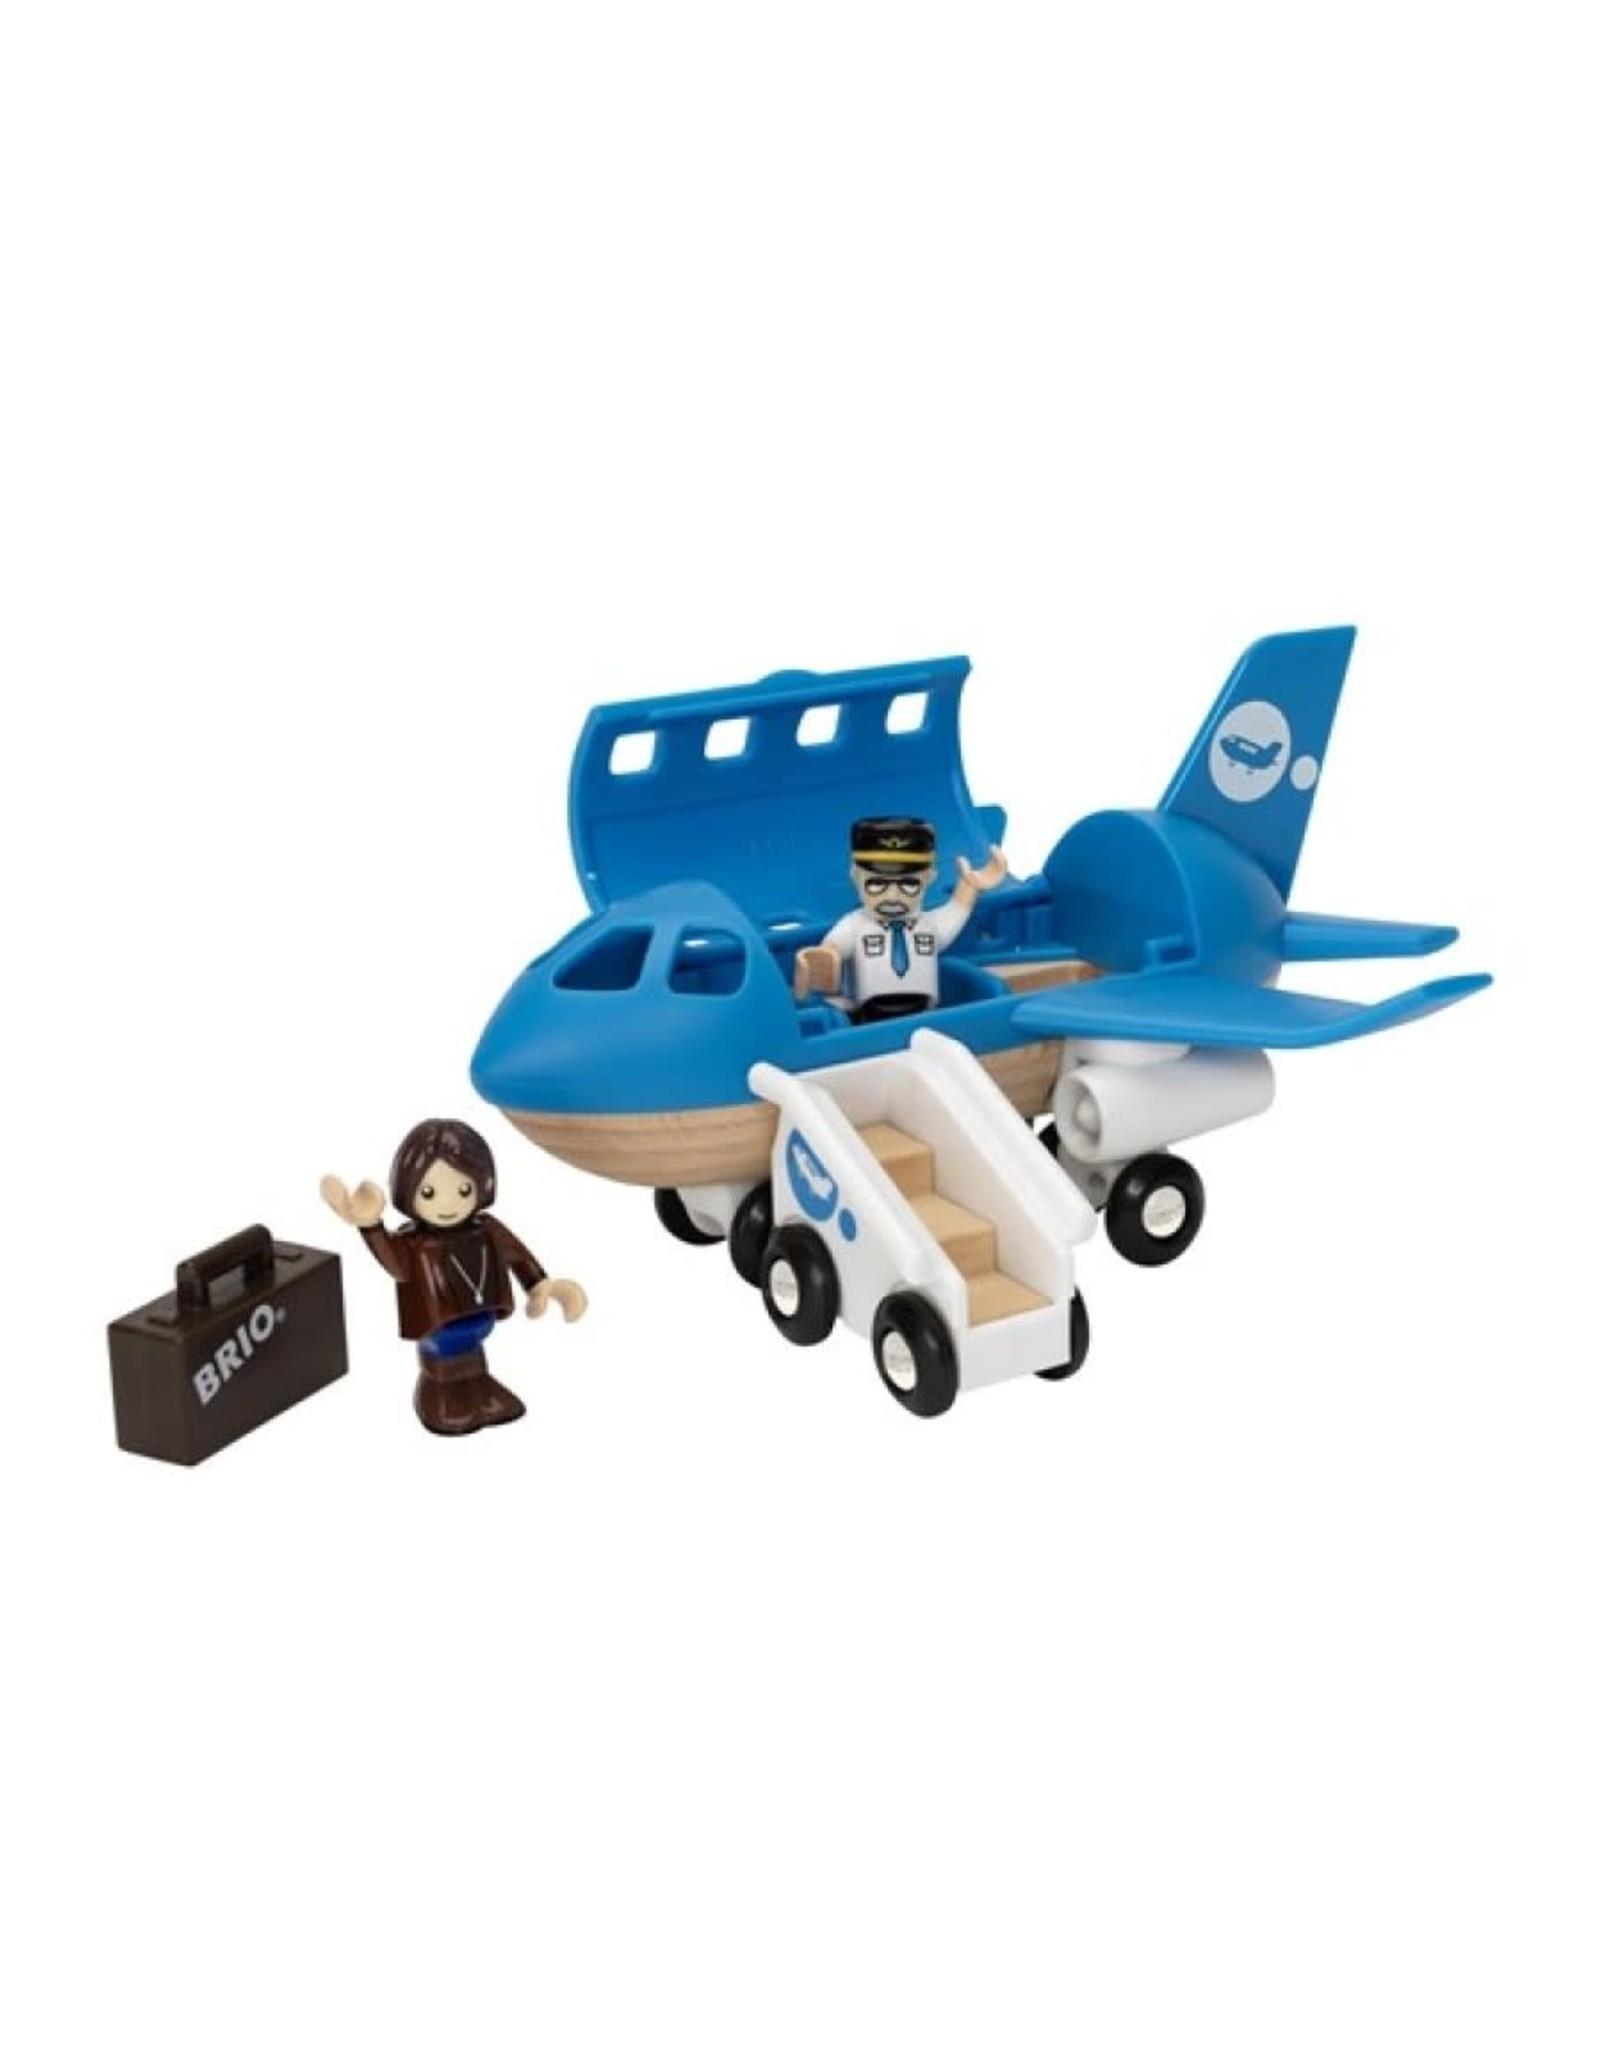 Brio Brio - Airplane